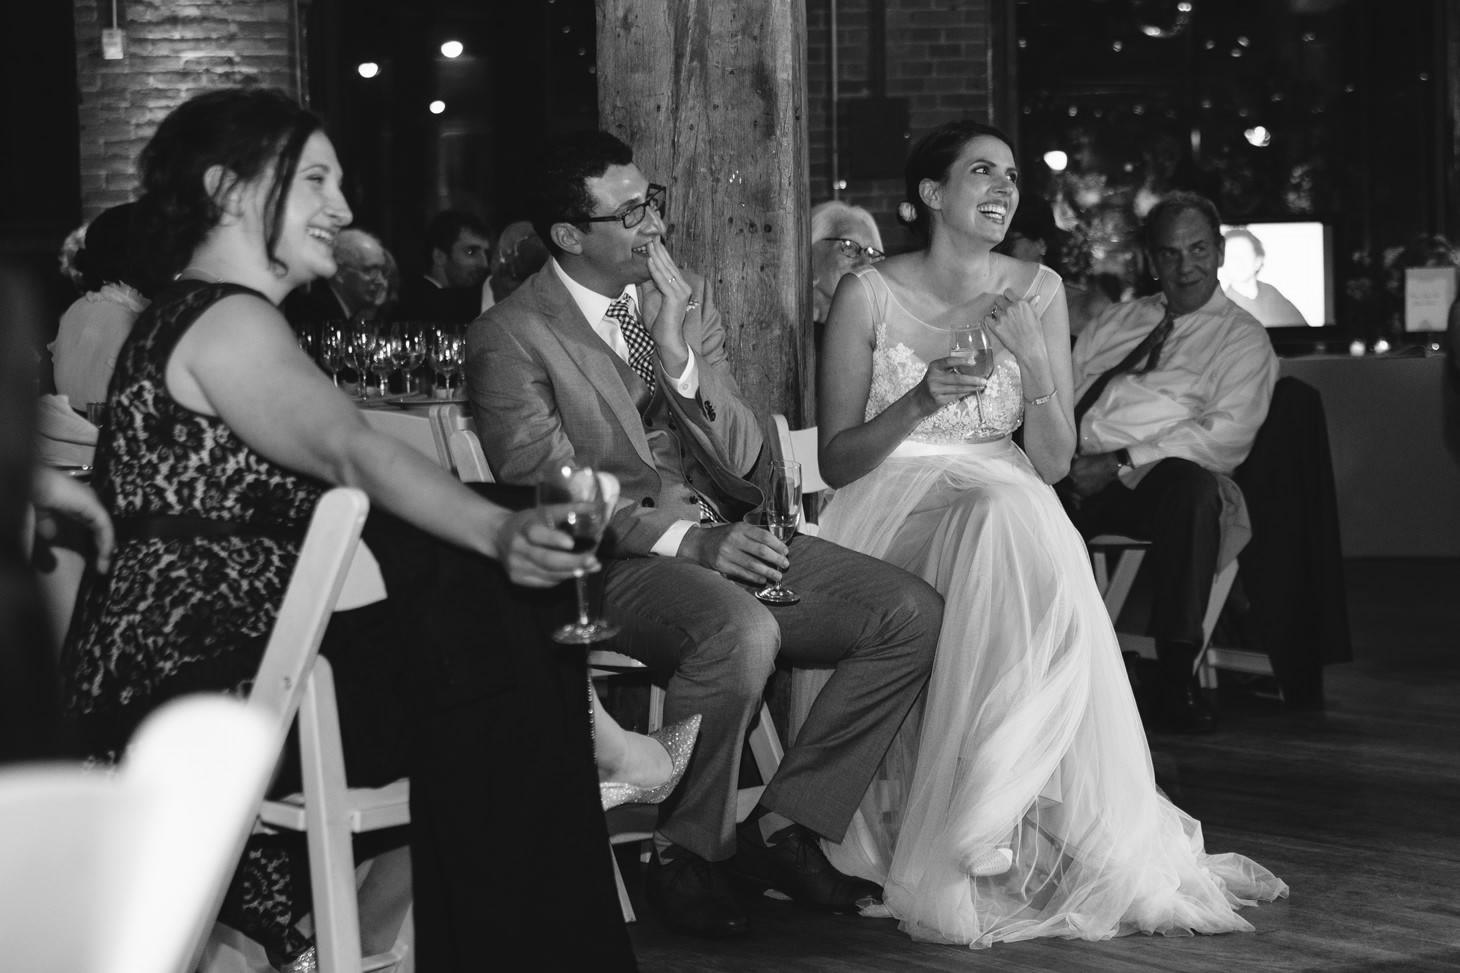 045-nyc-dumbo-loft-brooklyn-wedding-photographer-smitten-chickens-photo-.jpg